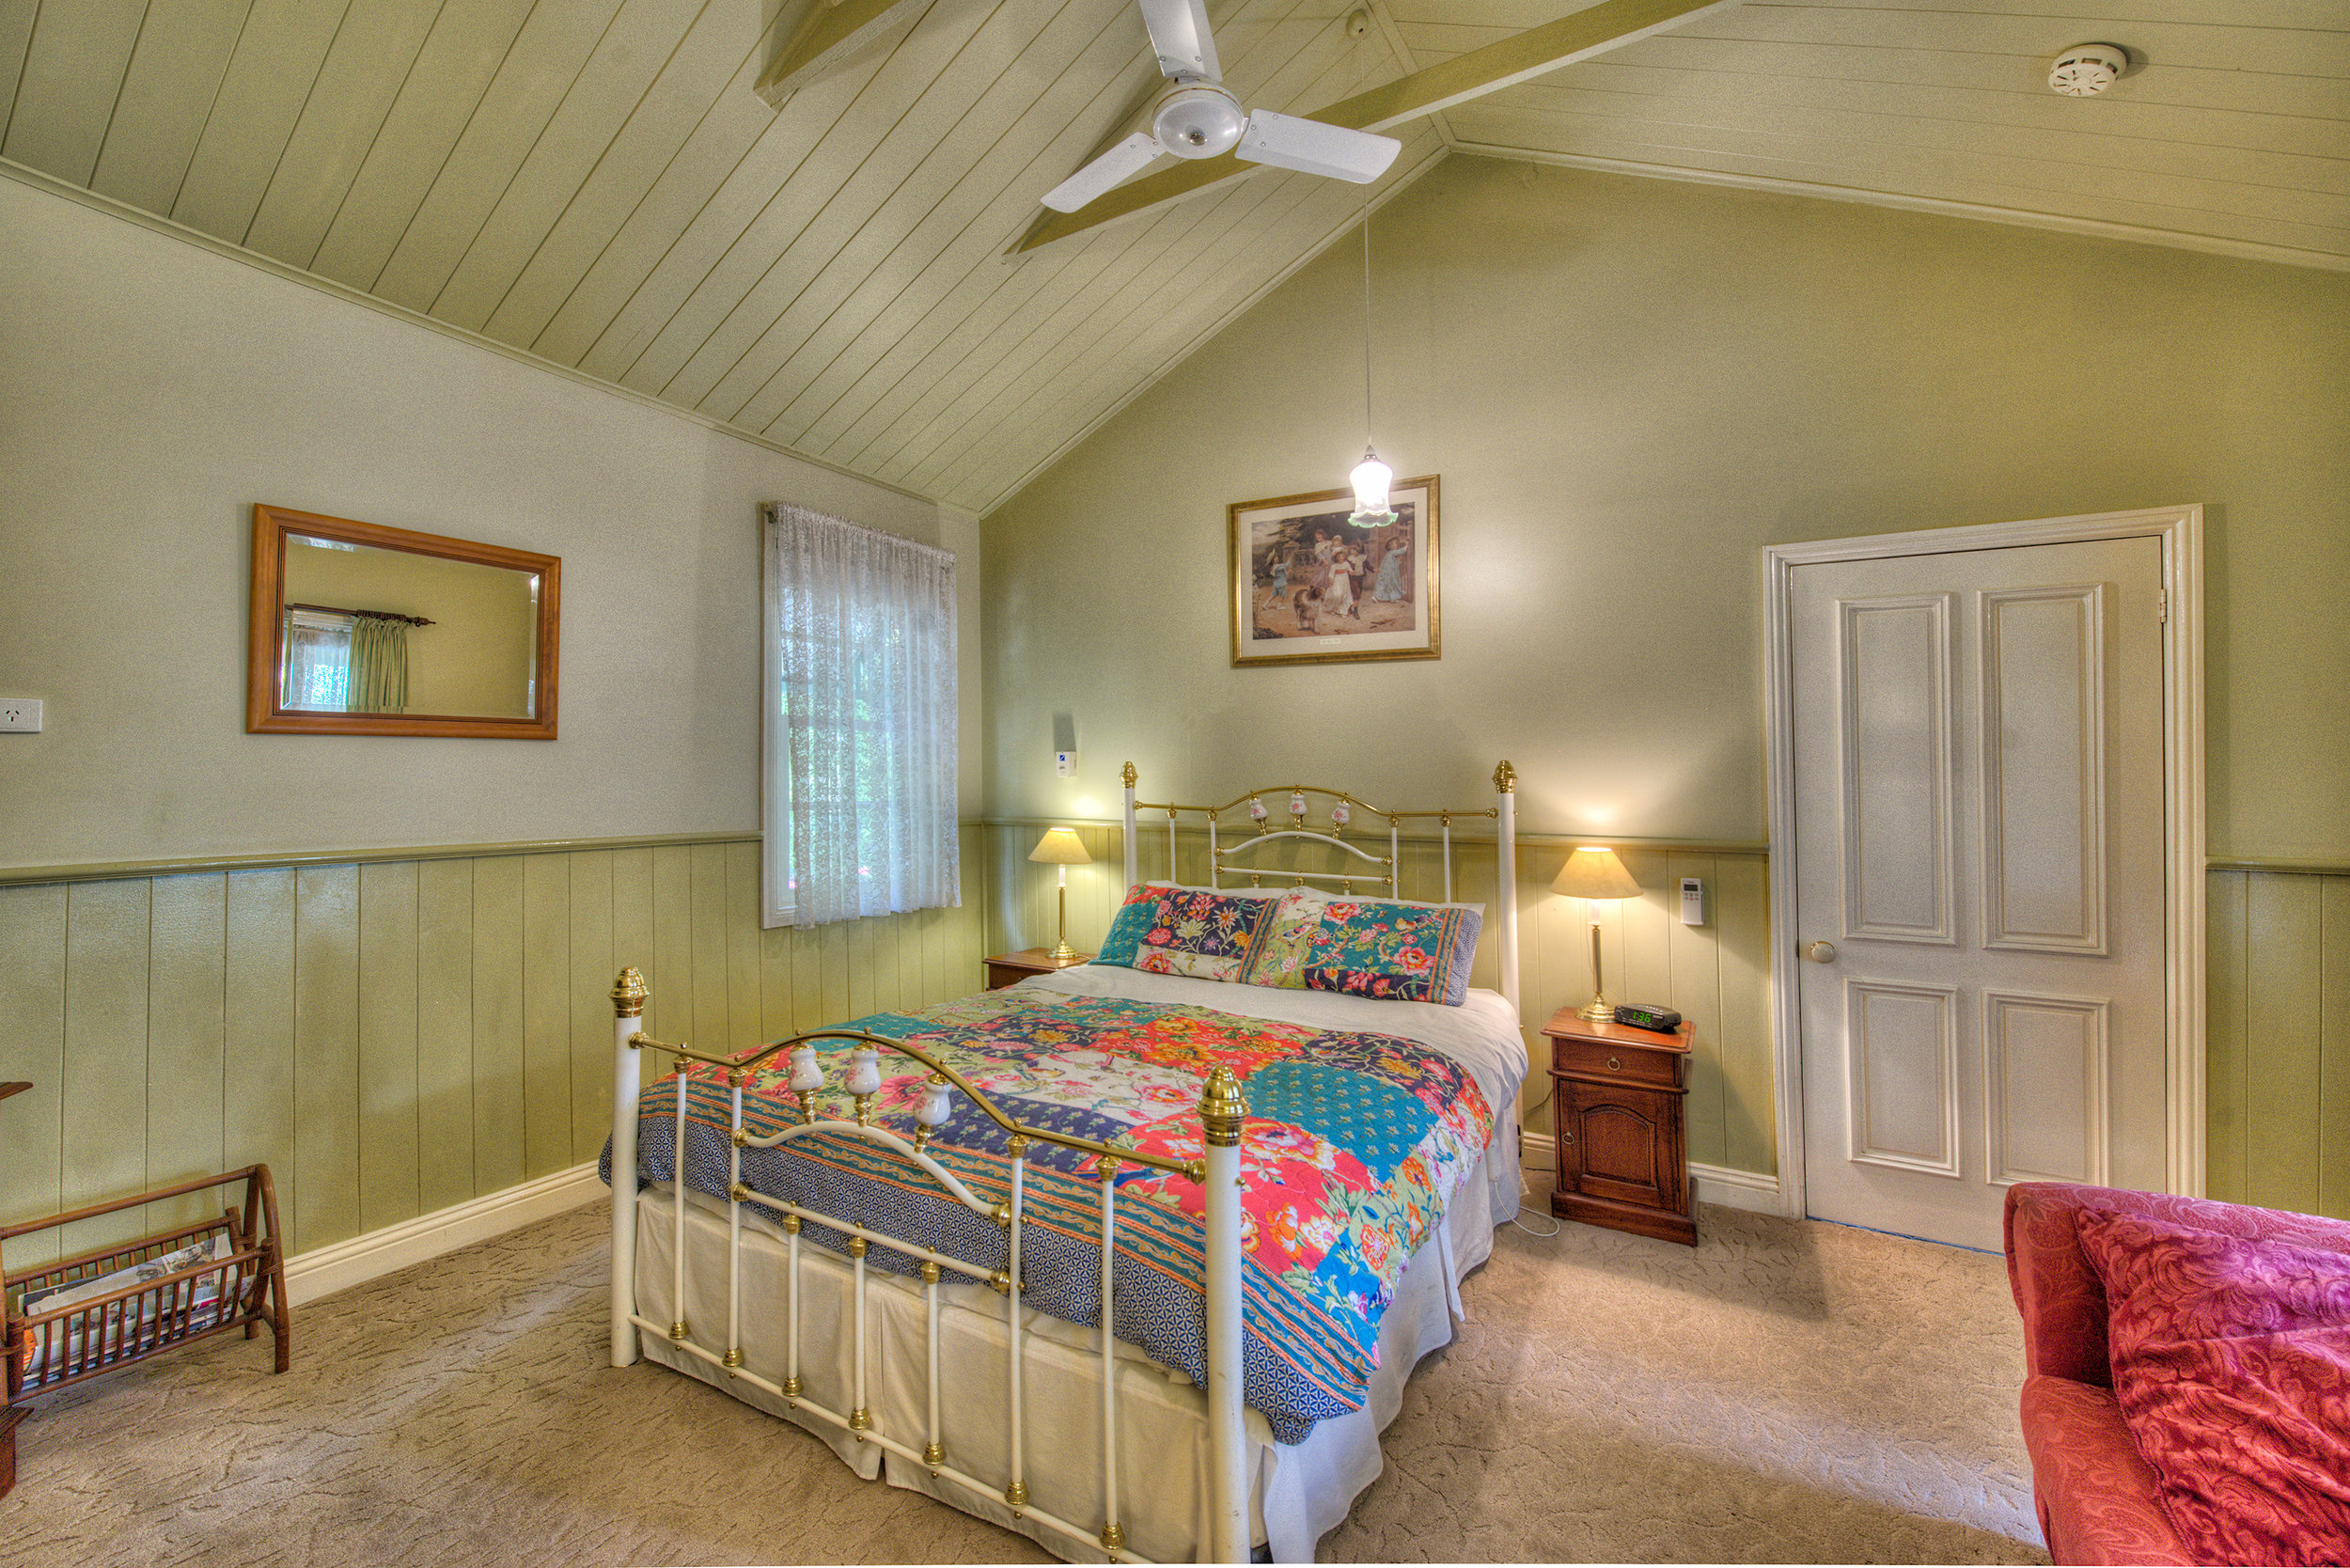 Robins-Nest-Bedroom-2.jpg